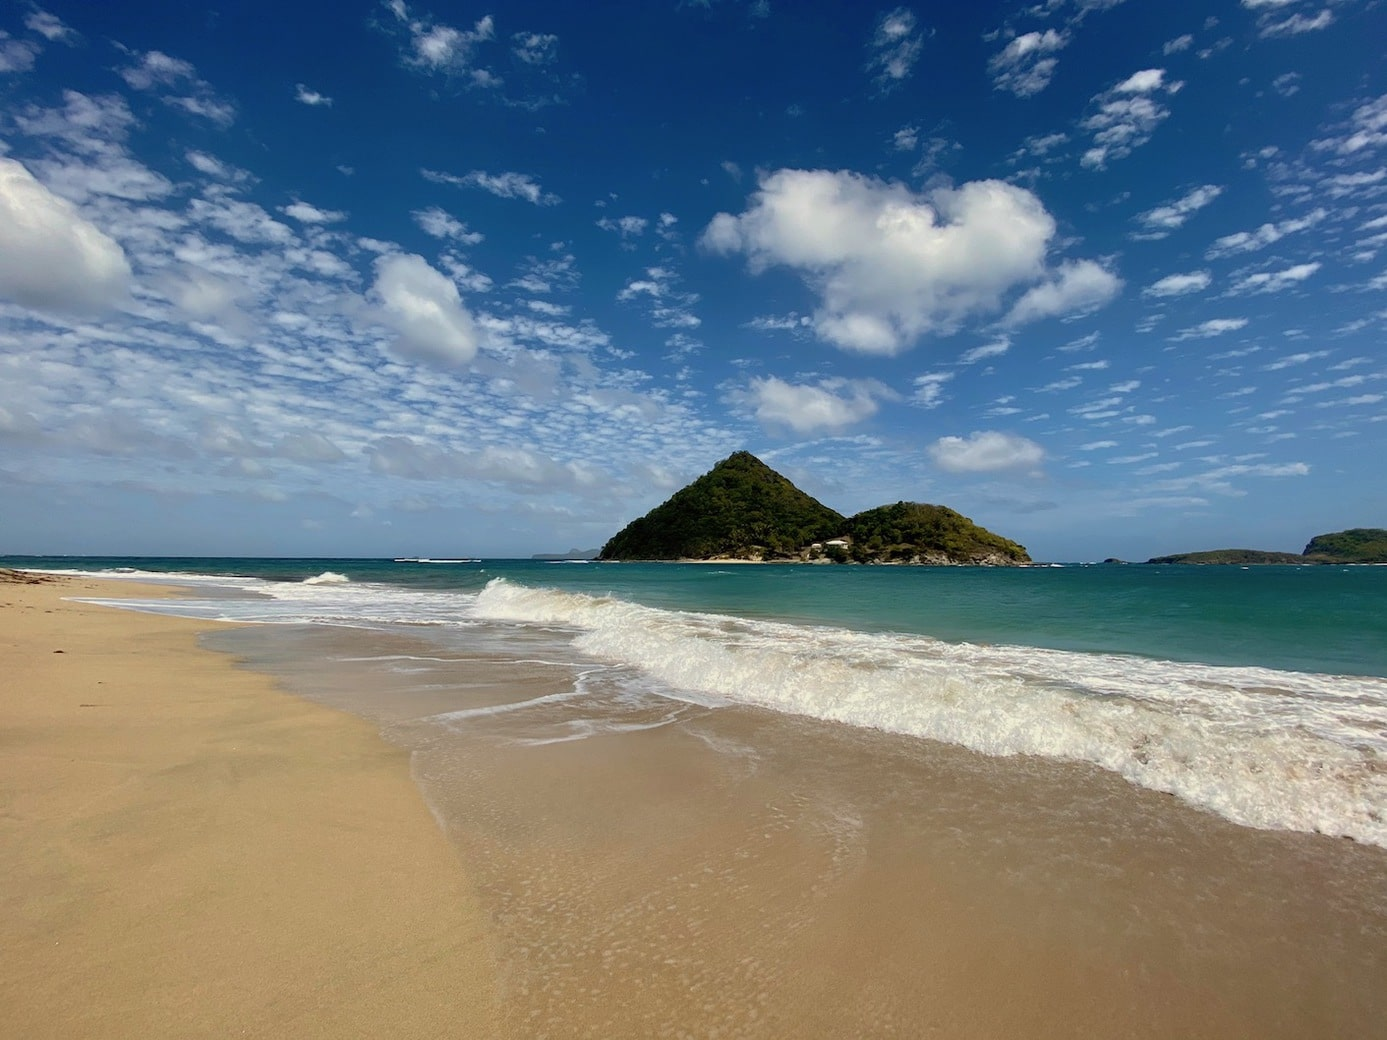 Wild and beautiful beach